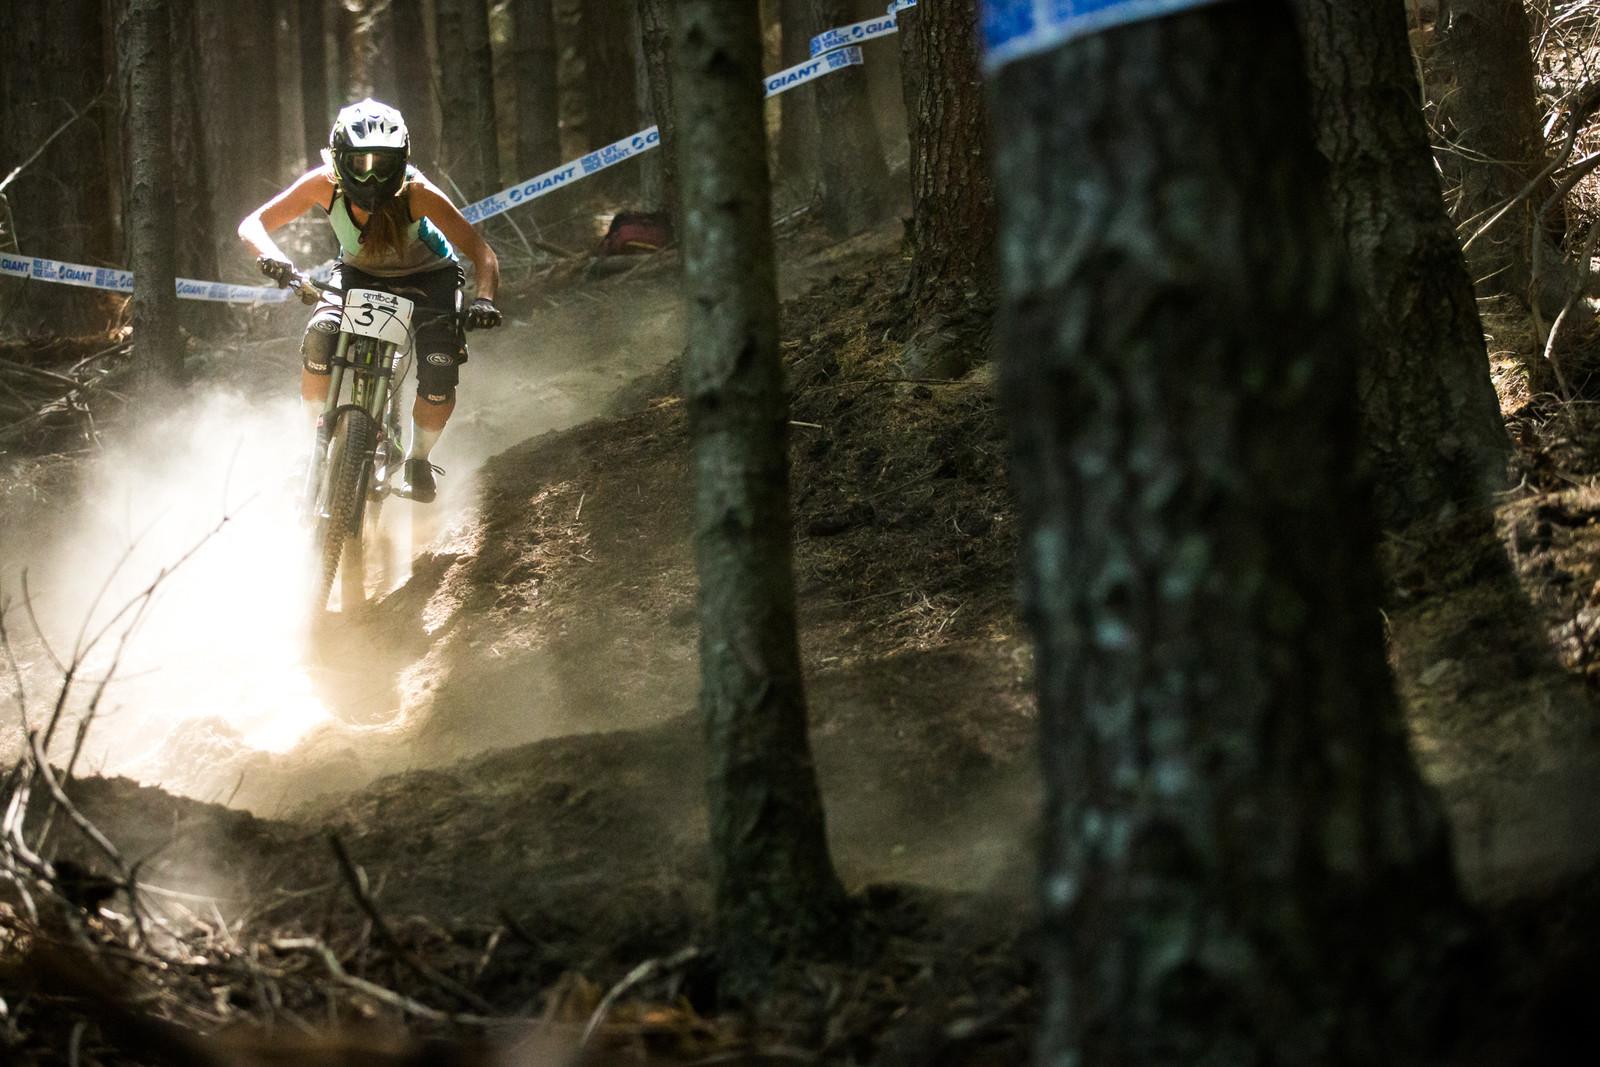 Lucie Vodrazkova - Homegrown NZ Downhill - Vertigo Bikes Ride More DH Series Race 1 - Mountain Biking Pictures - Vital MTB